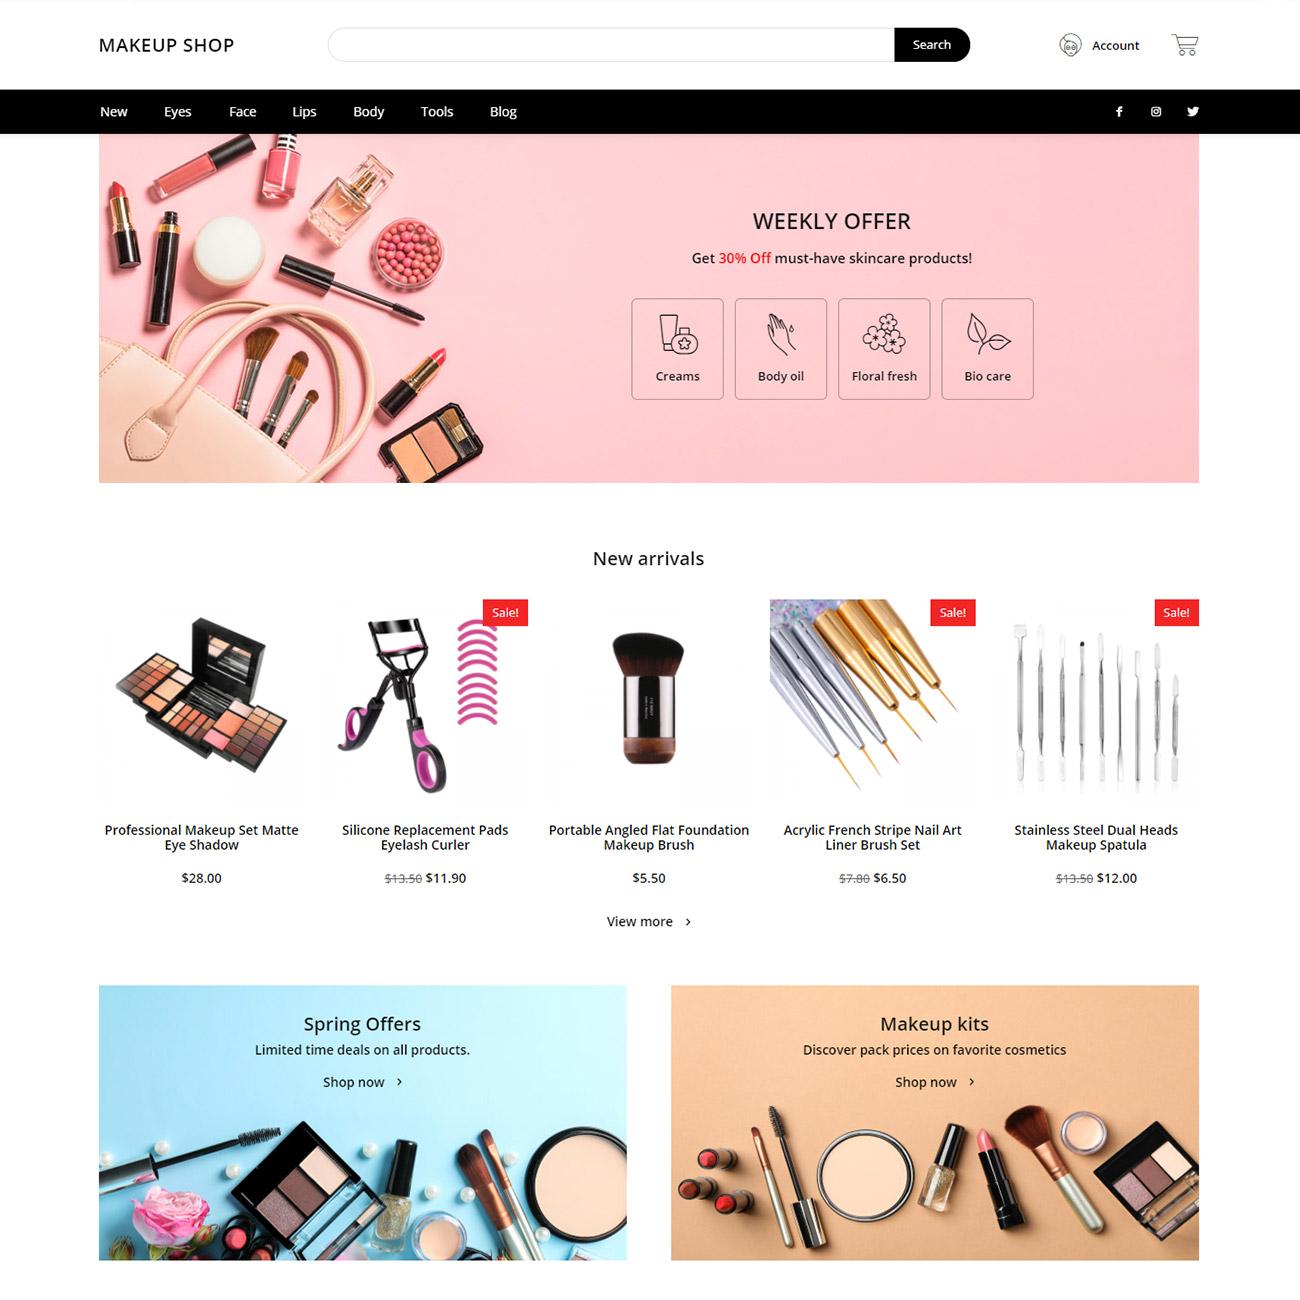 Discover the Makeup Shop